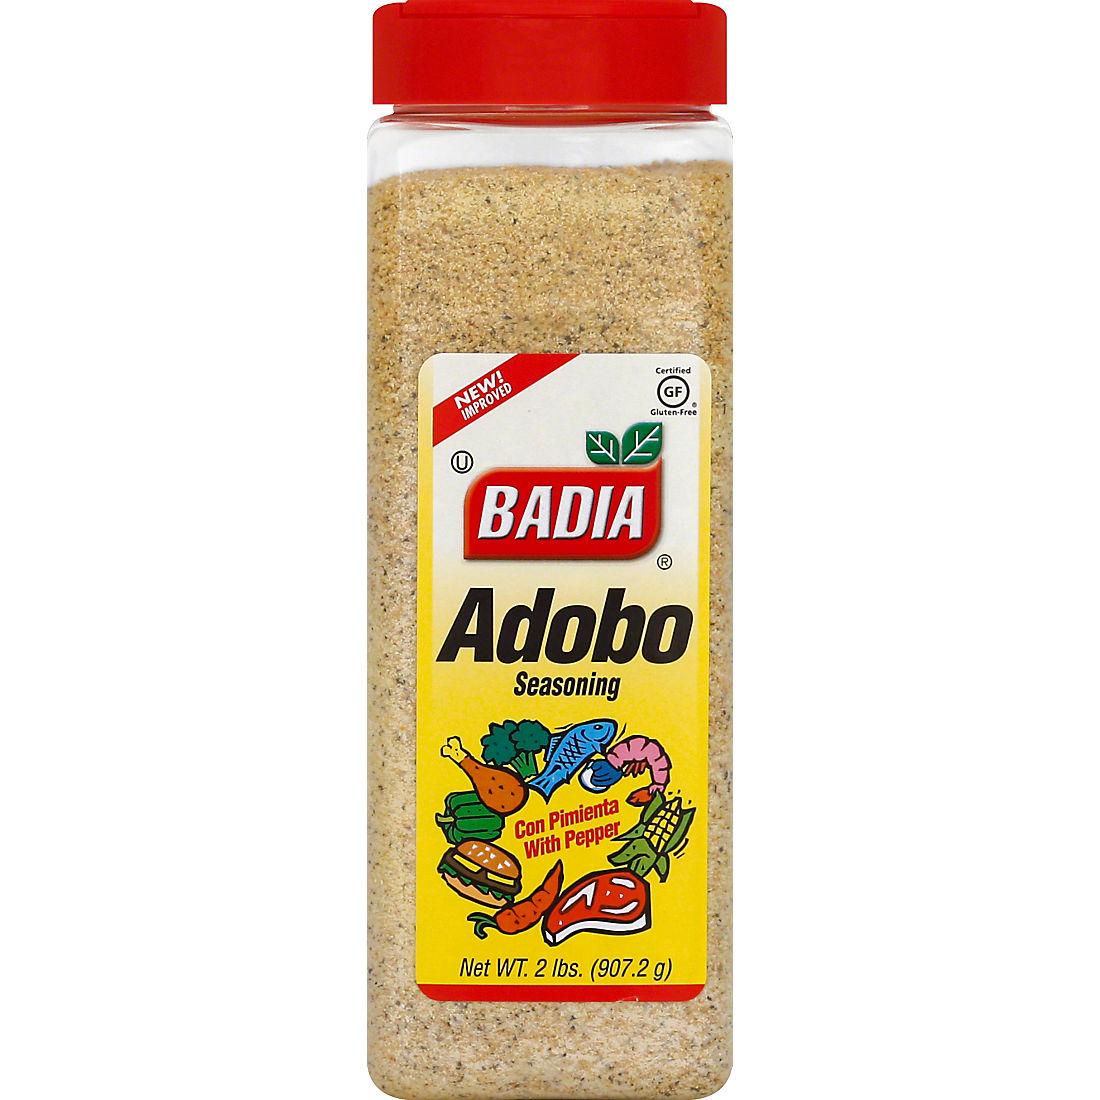 Badia Adobo Seasoning With Pepper 32 Oz Bjs Wholesale Club